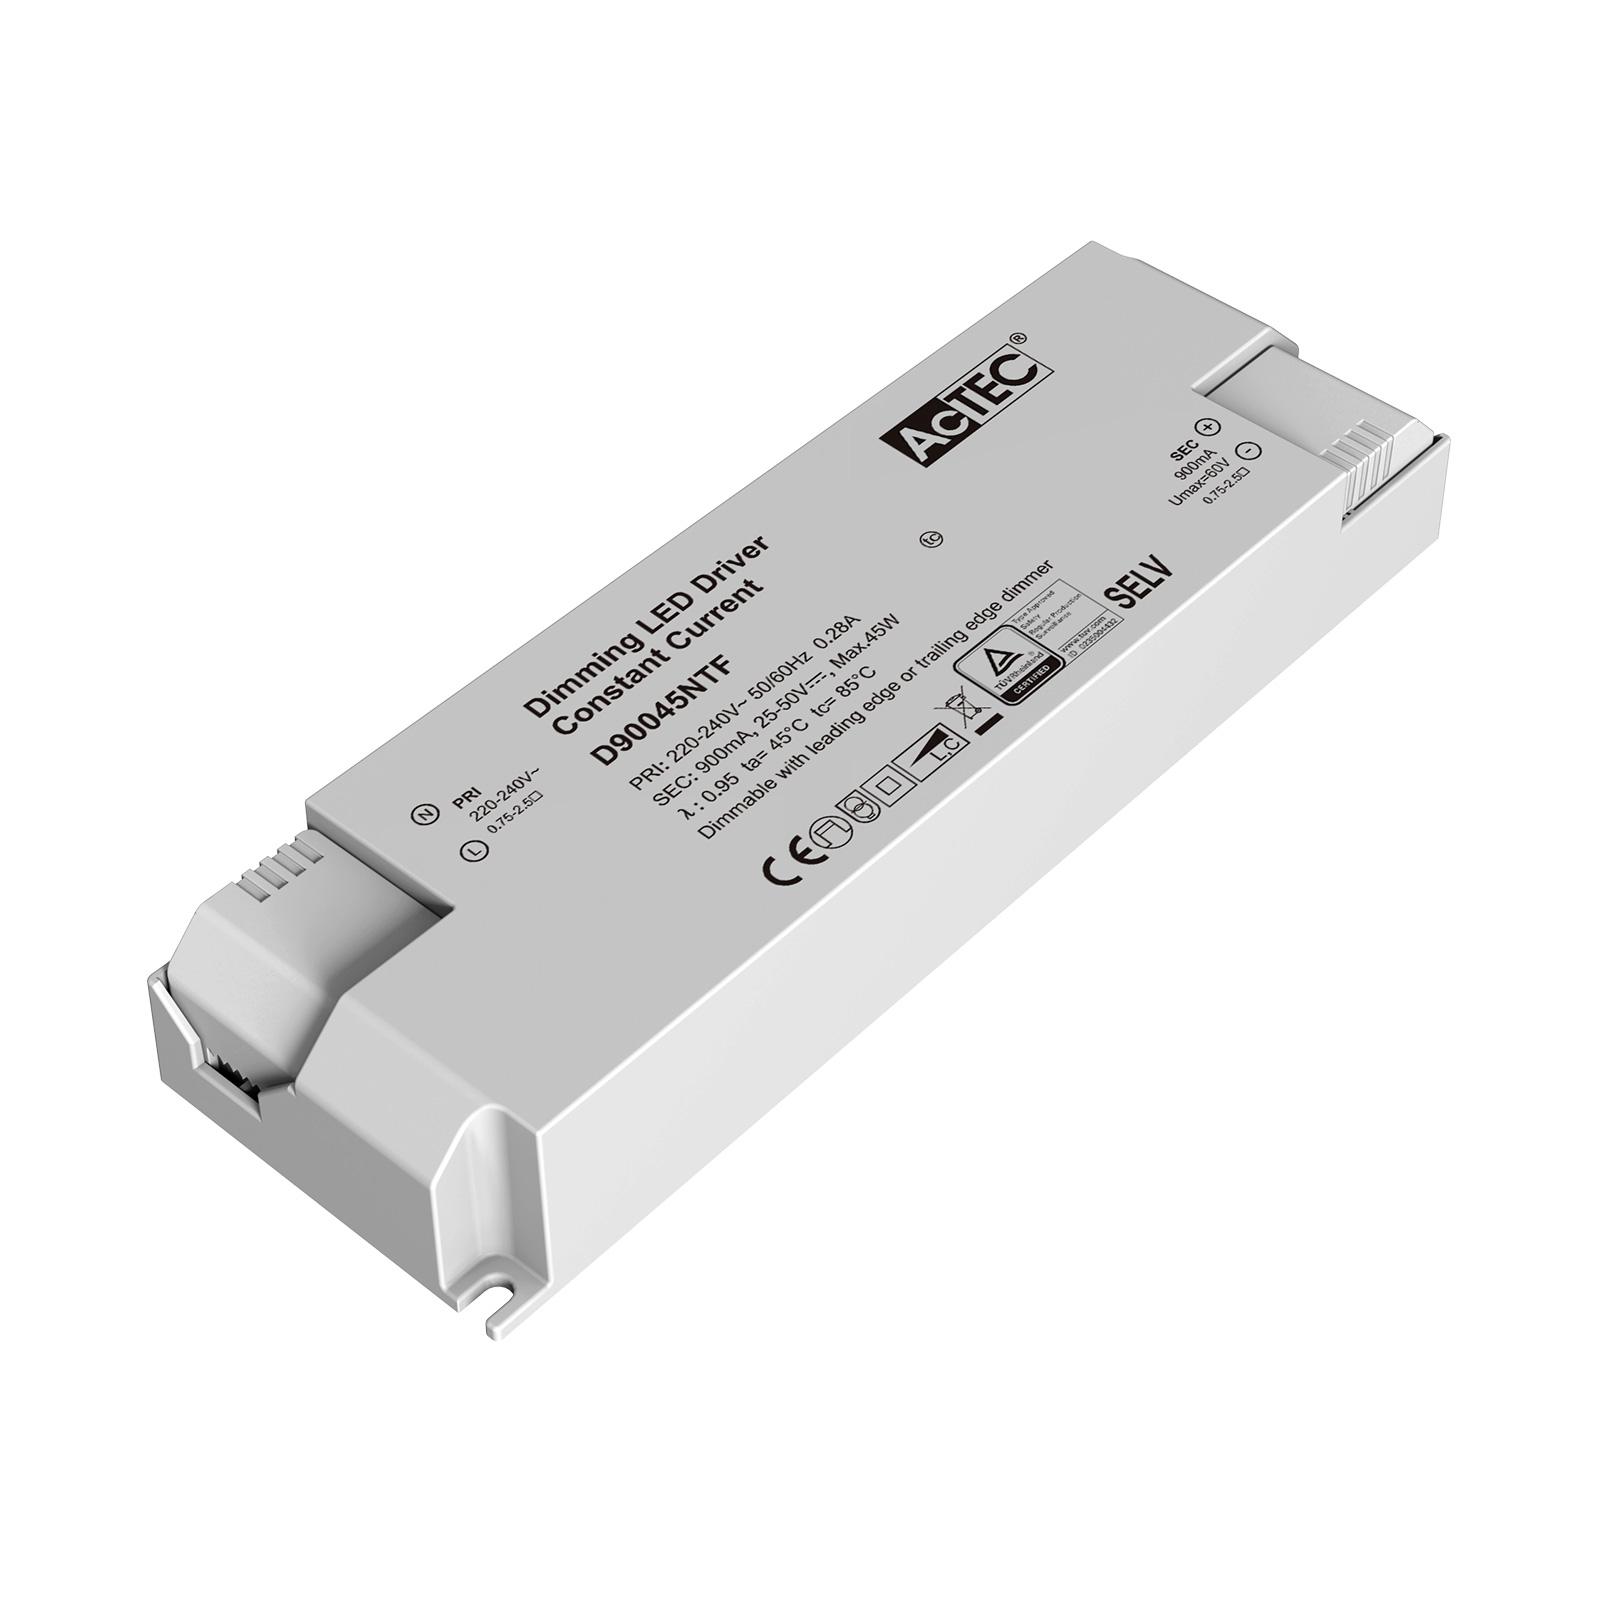 AcTEC Triac LED-driver CC maks. 45W 900mA